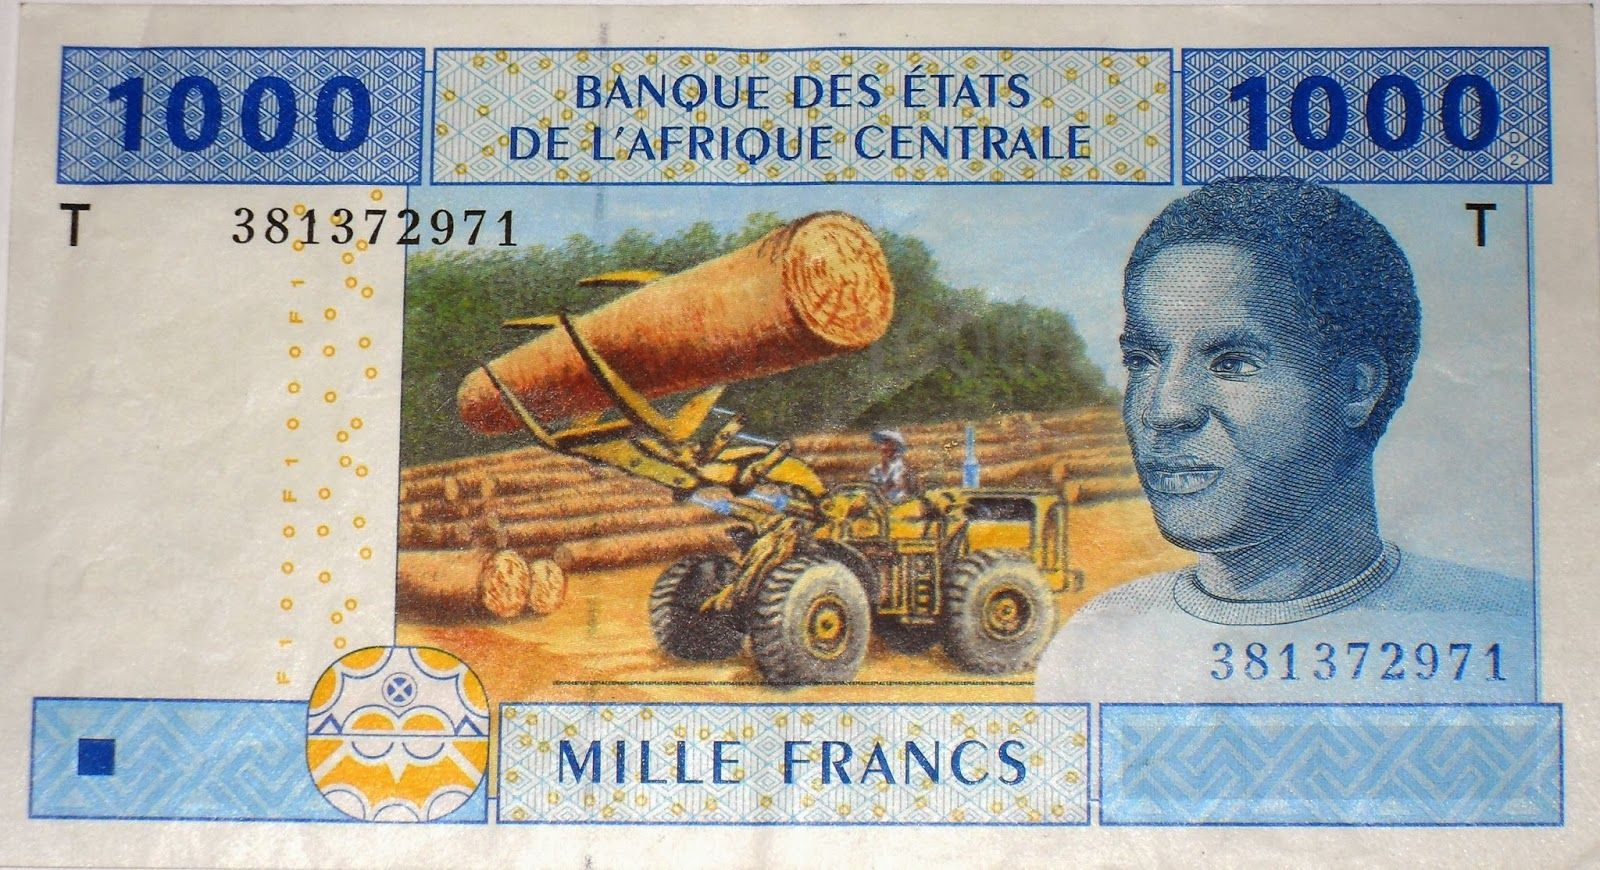 Billete de 100 Pesetas Guineanas 1969 D0b1a98c37a27f9192af303239a61c92